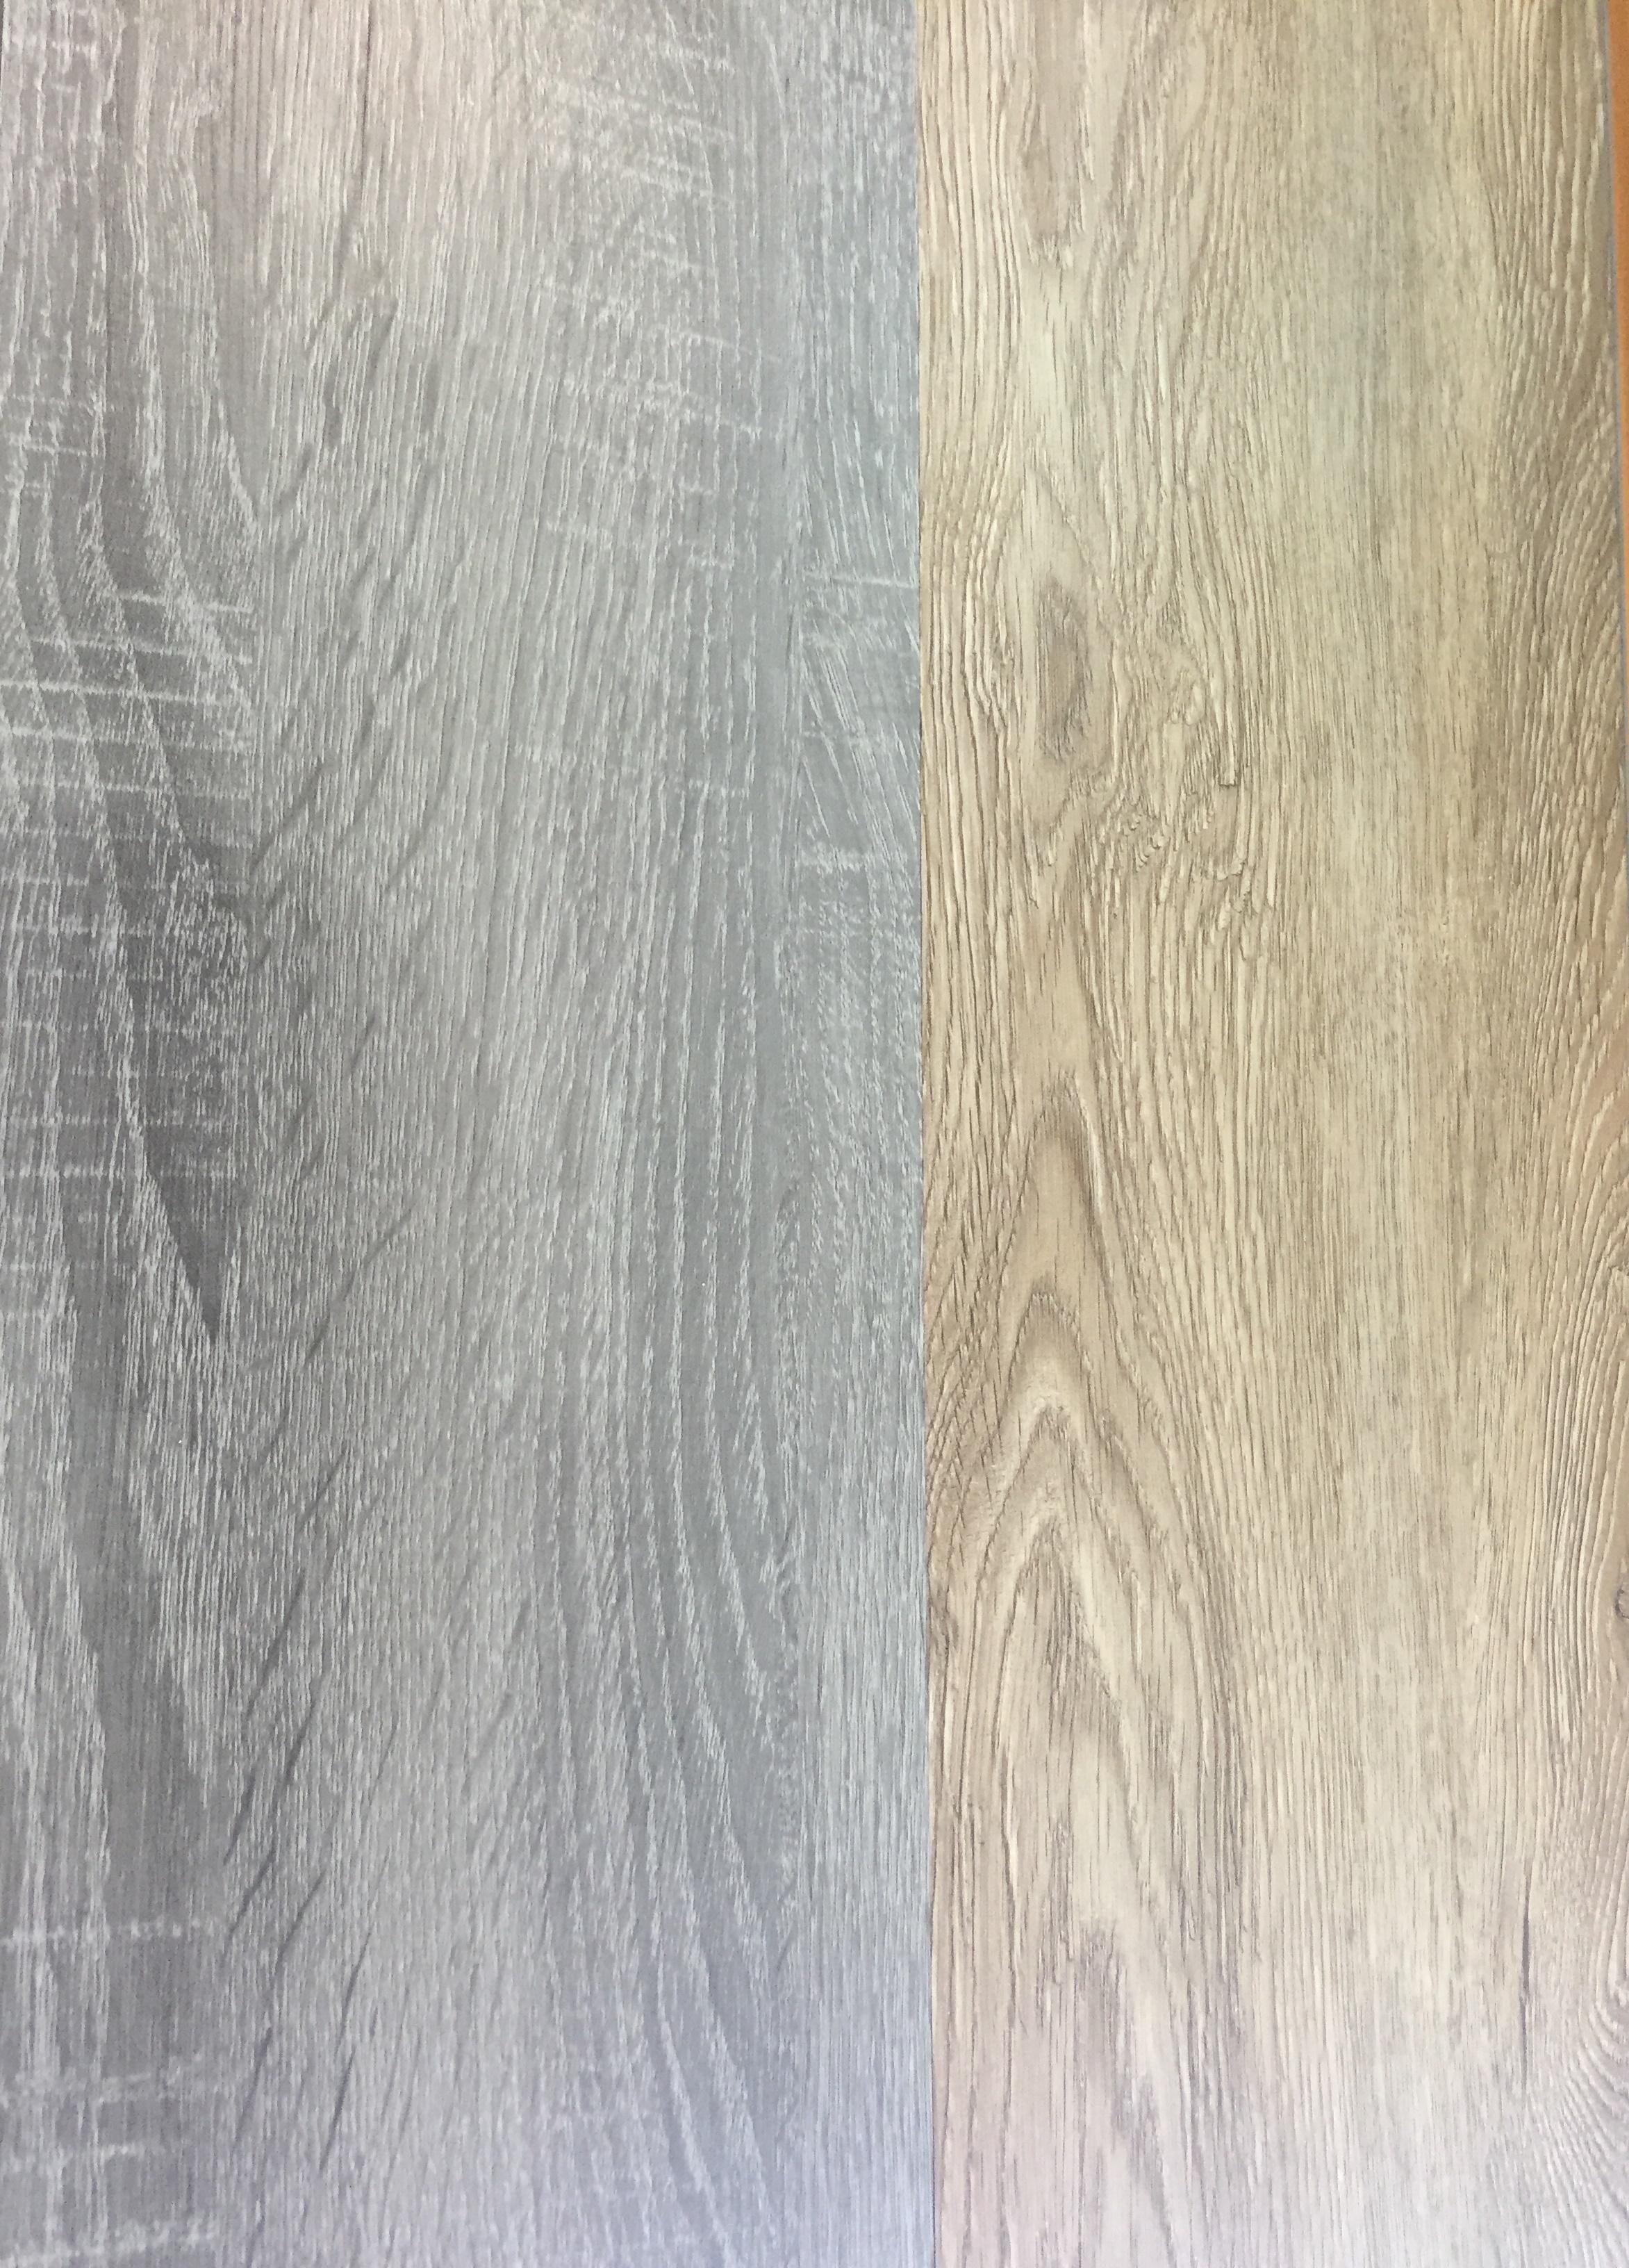 Is  Mil Vinyl Flooring Good For The Kitchen